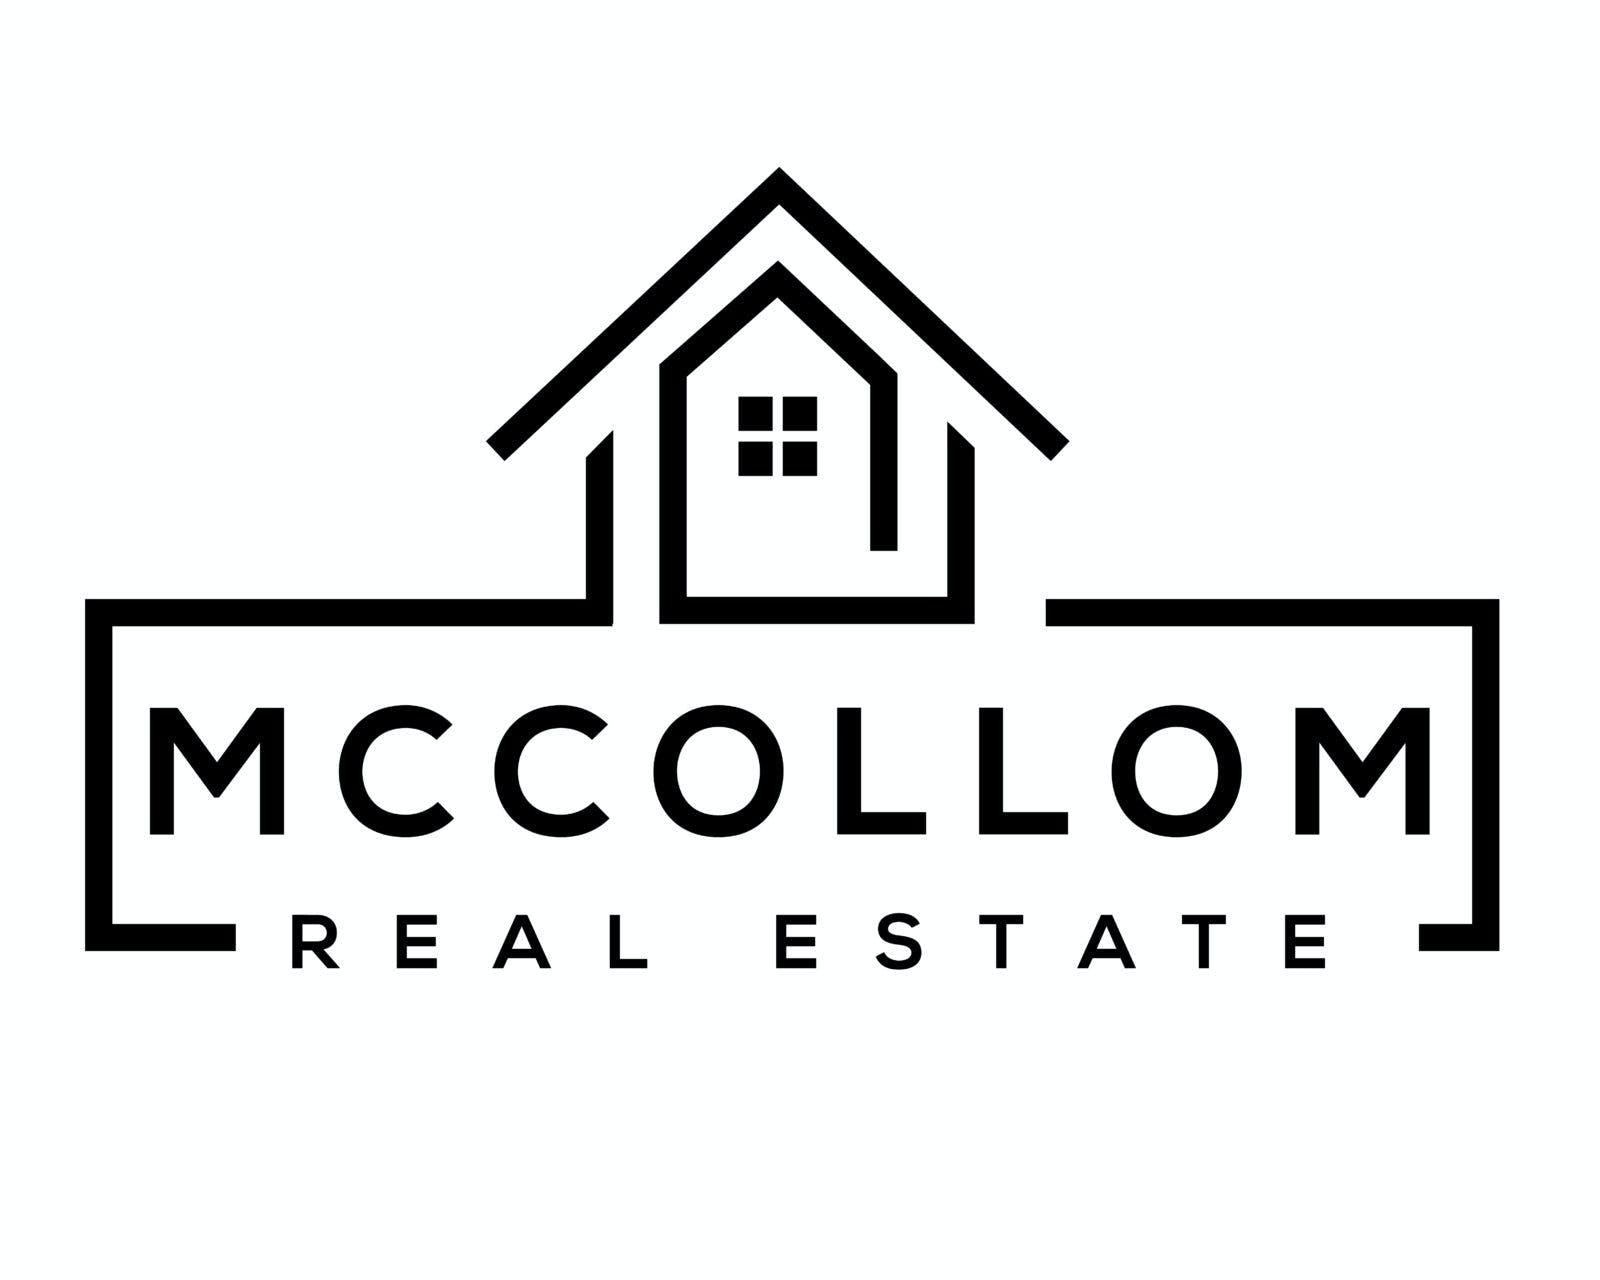 McCollom Real Estate Ltd.